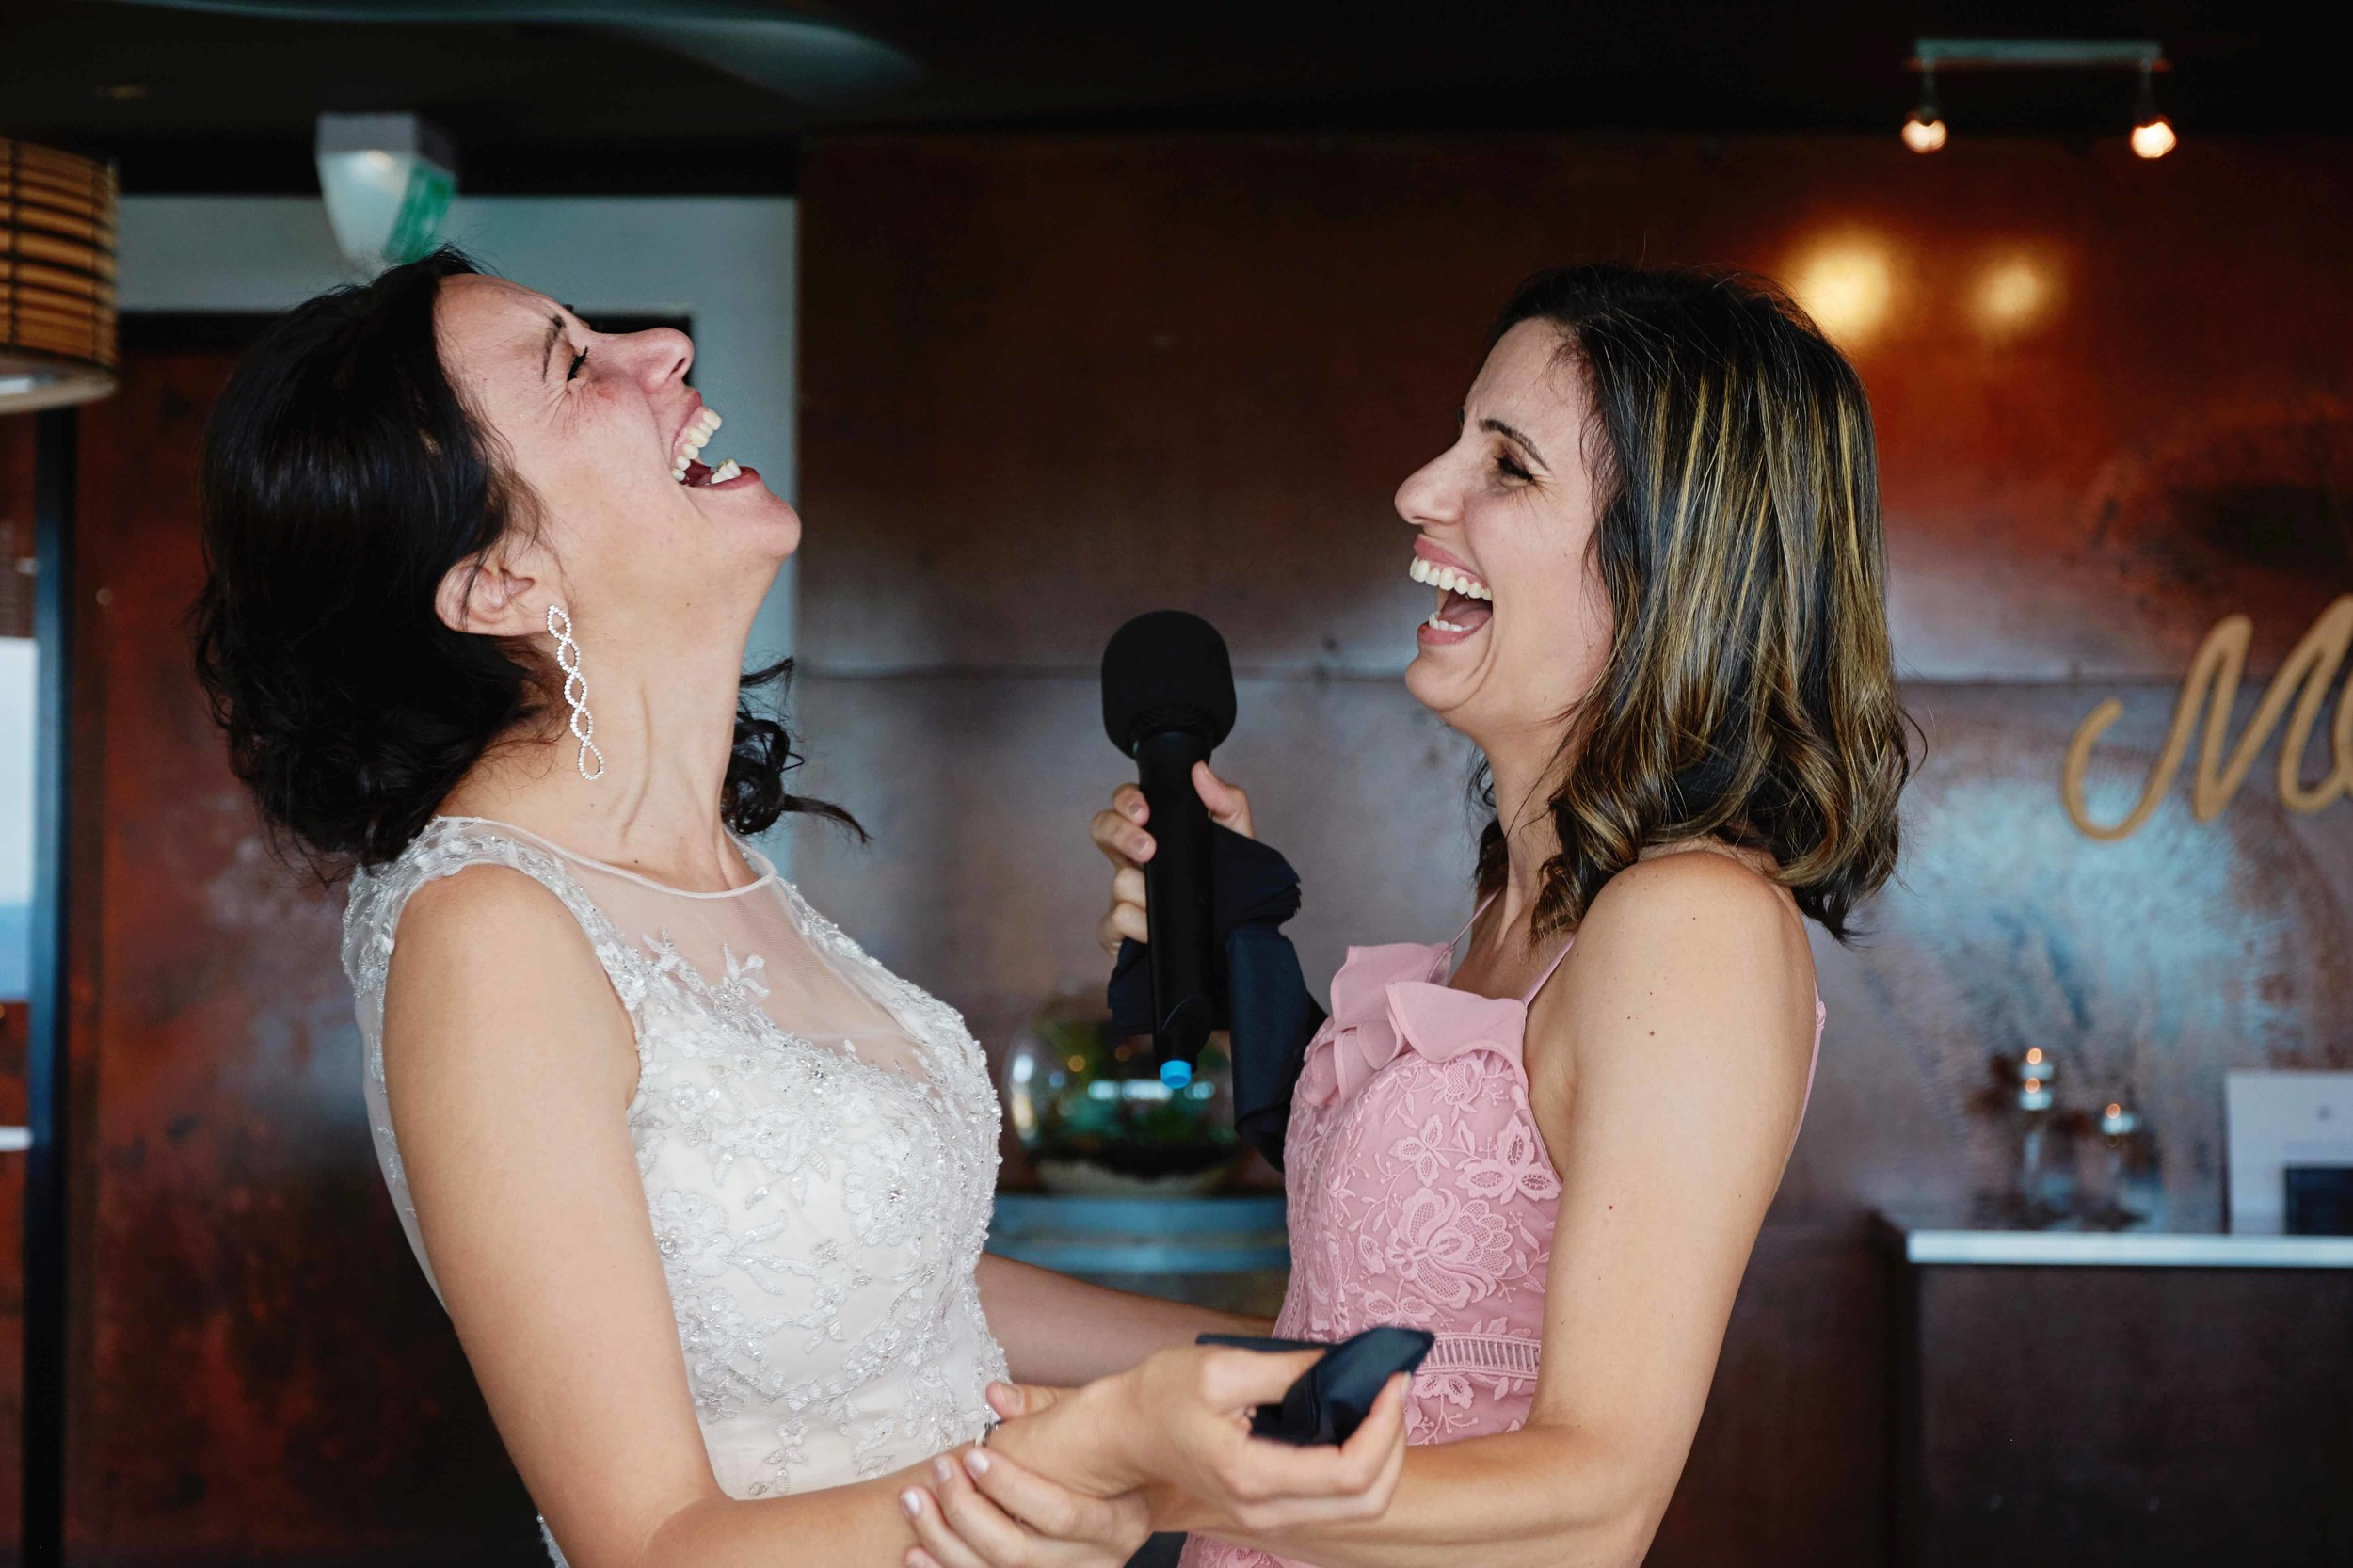 sorrento-wedding-photography-all-smiles-marissa-jade-photography-100.jpg